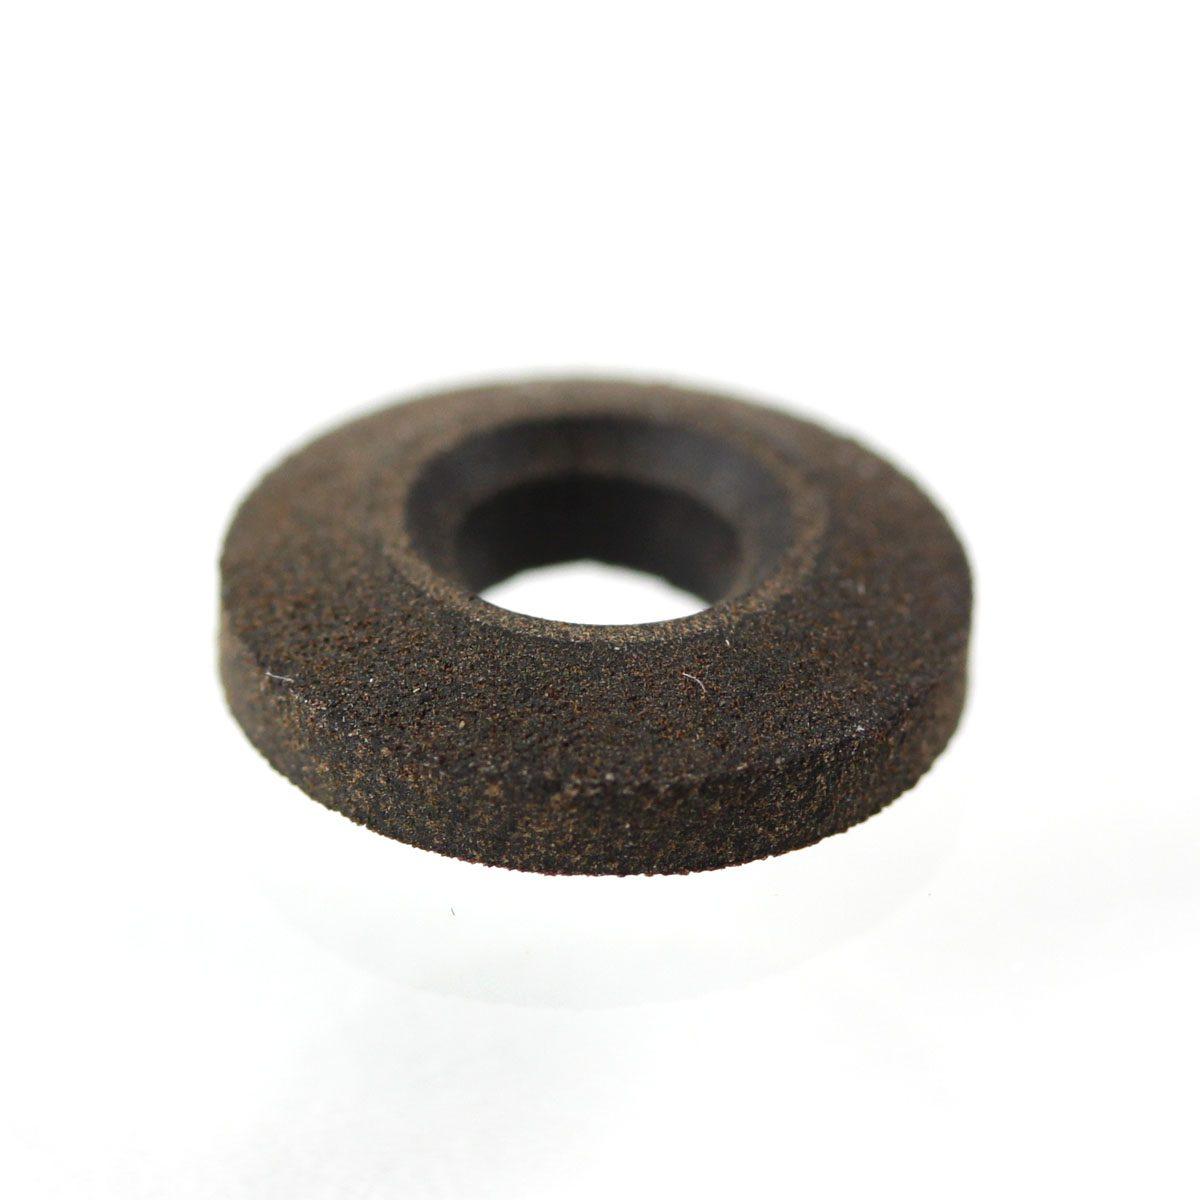 hard rubber clarinet tone hole insert od 436 id 205